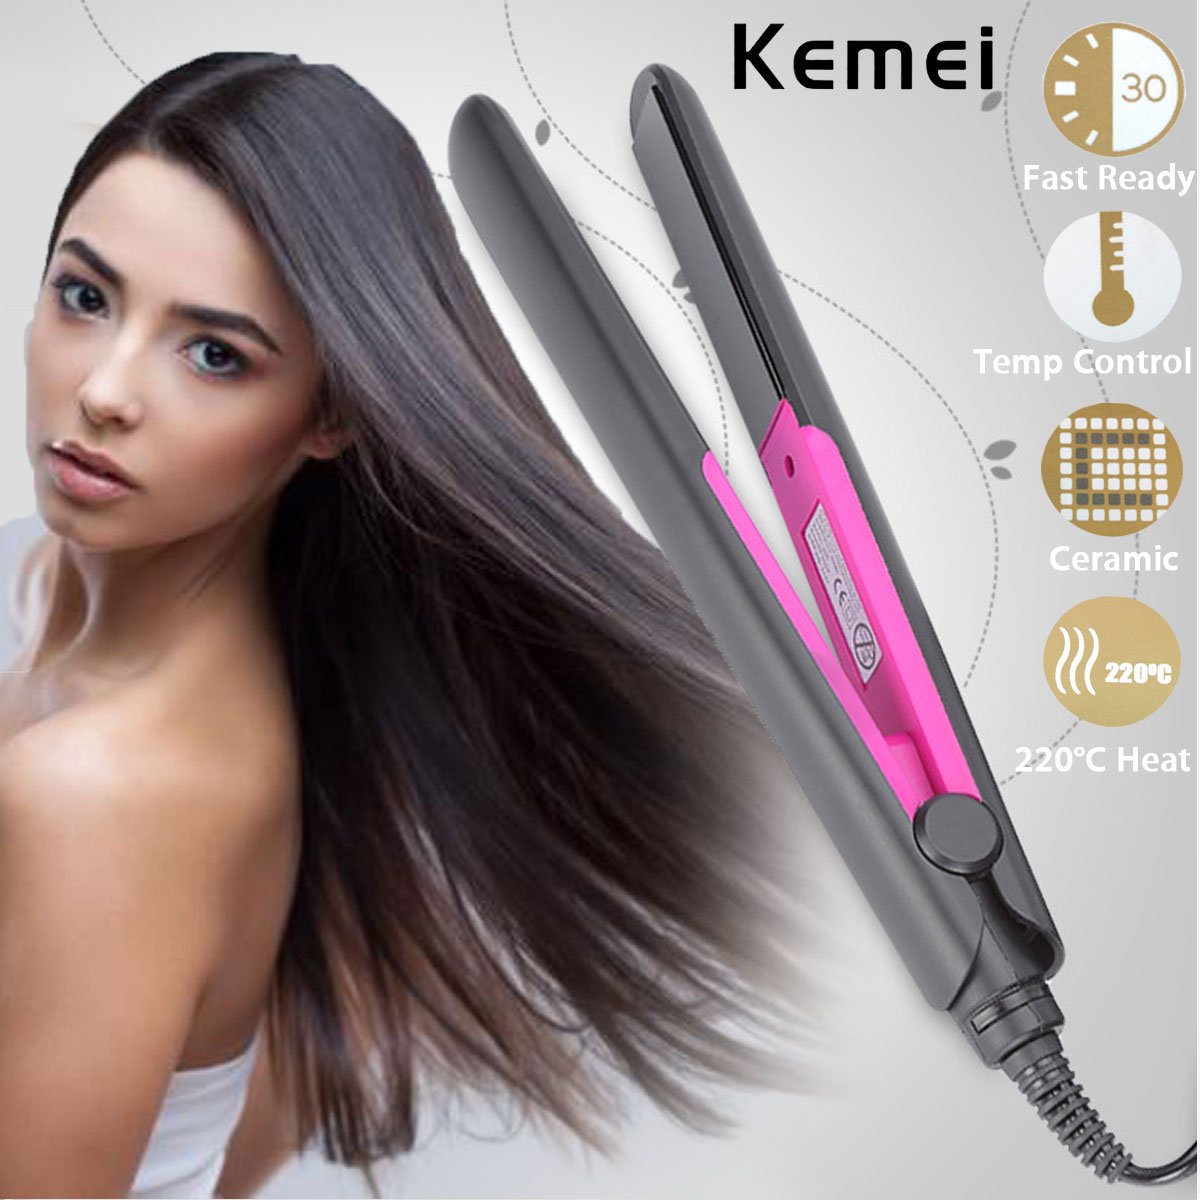 KEMEI Professional Straightening Irons Fast Heating Flat Iron Styling Tools Ceramic Tourmaline Plate Perm Hair Straightener